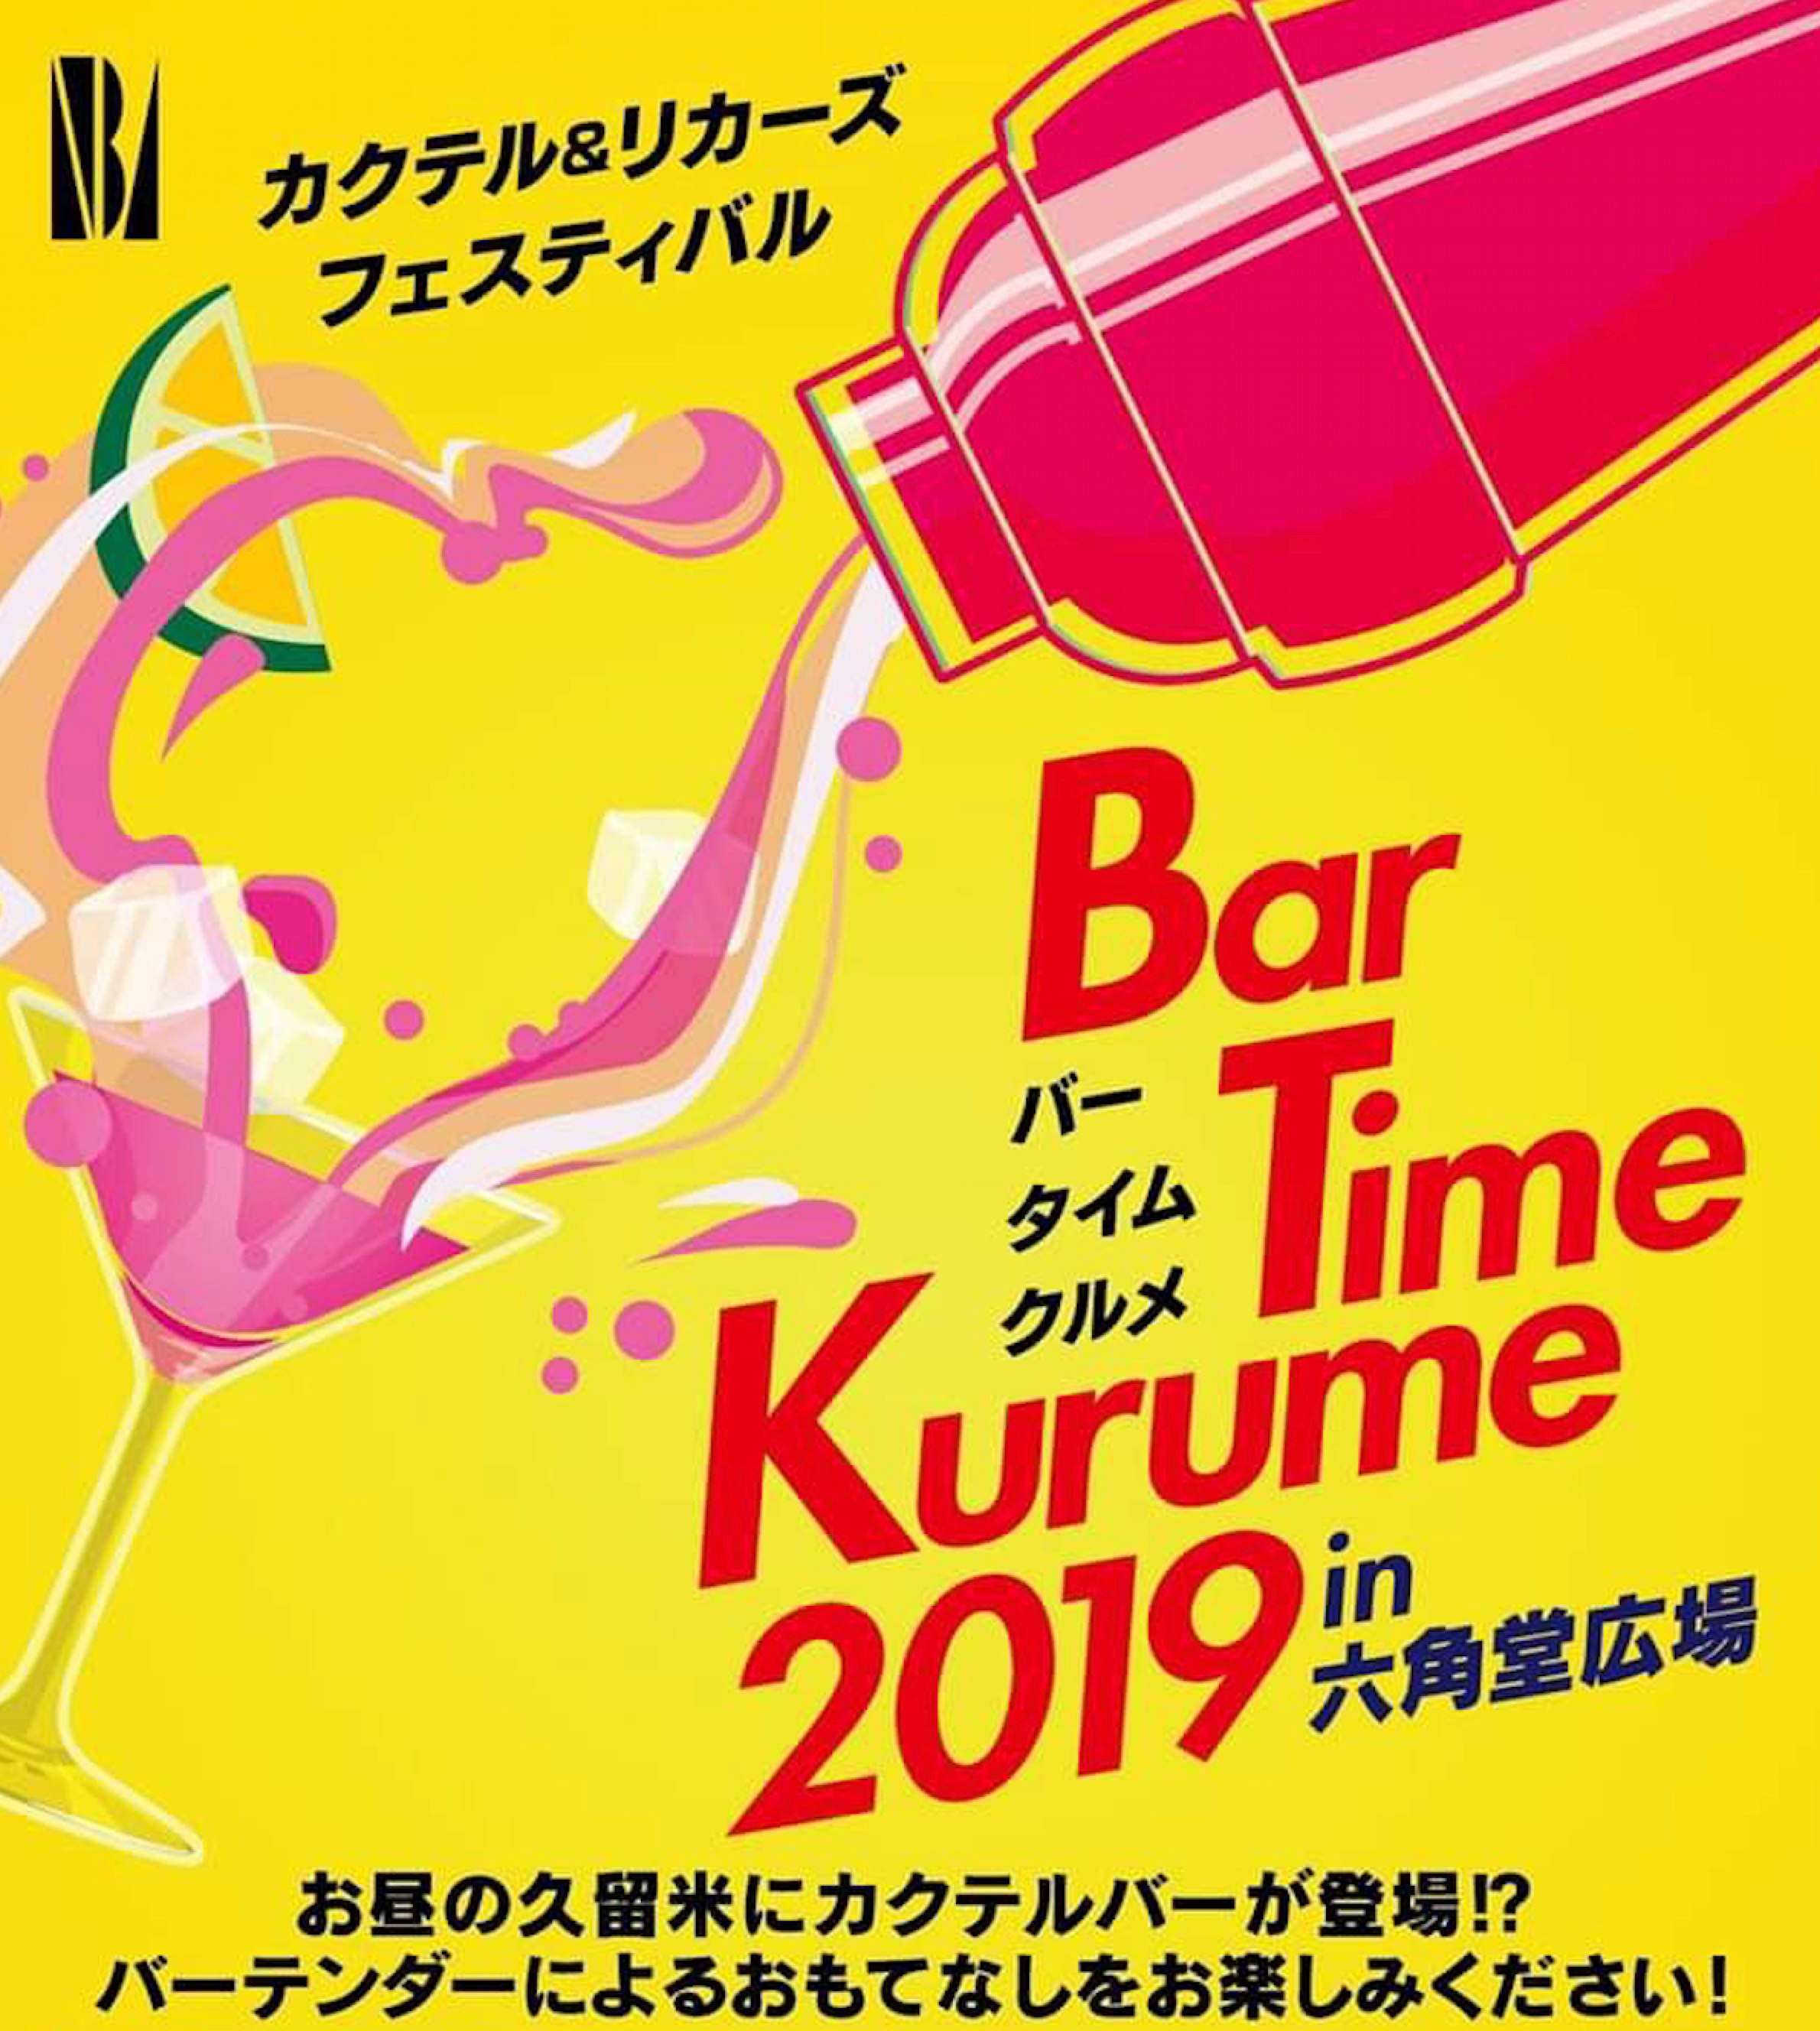 BAR TIME 久留米 カクテル&リカーズフェスティバル!お昼にカクテルバーが登場!